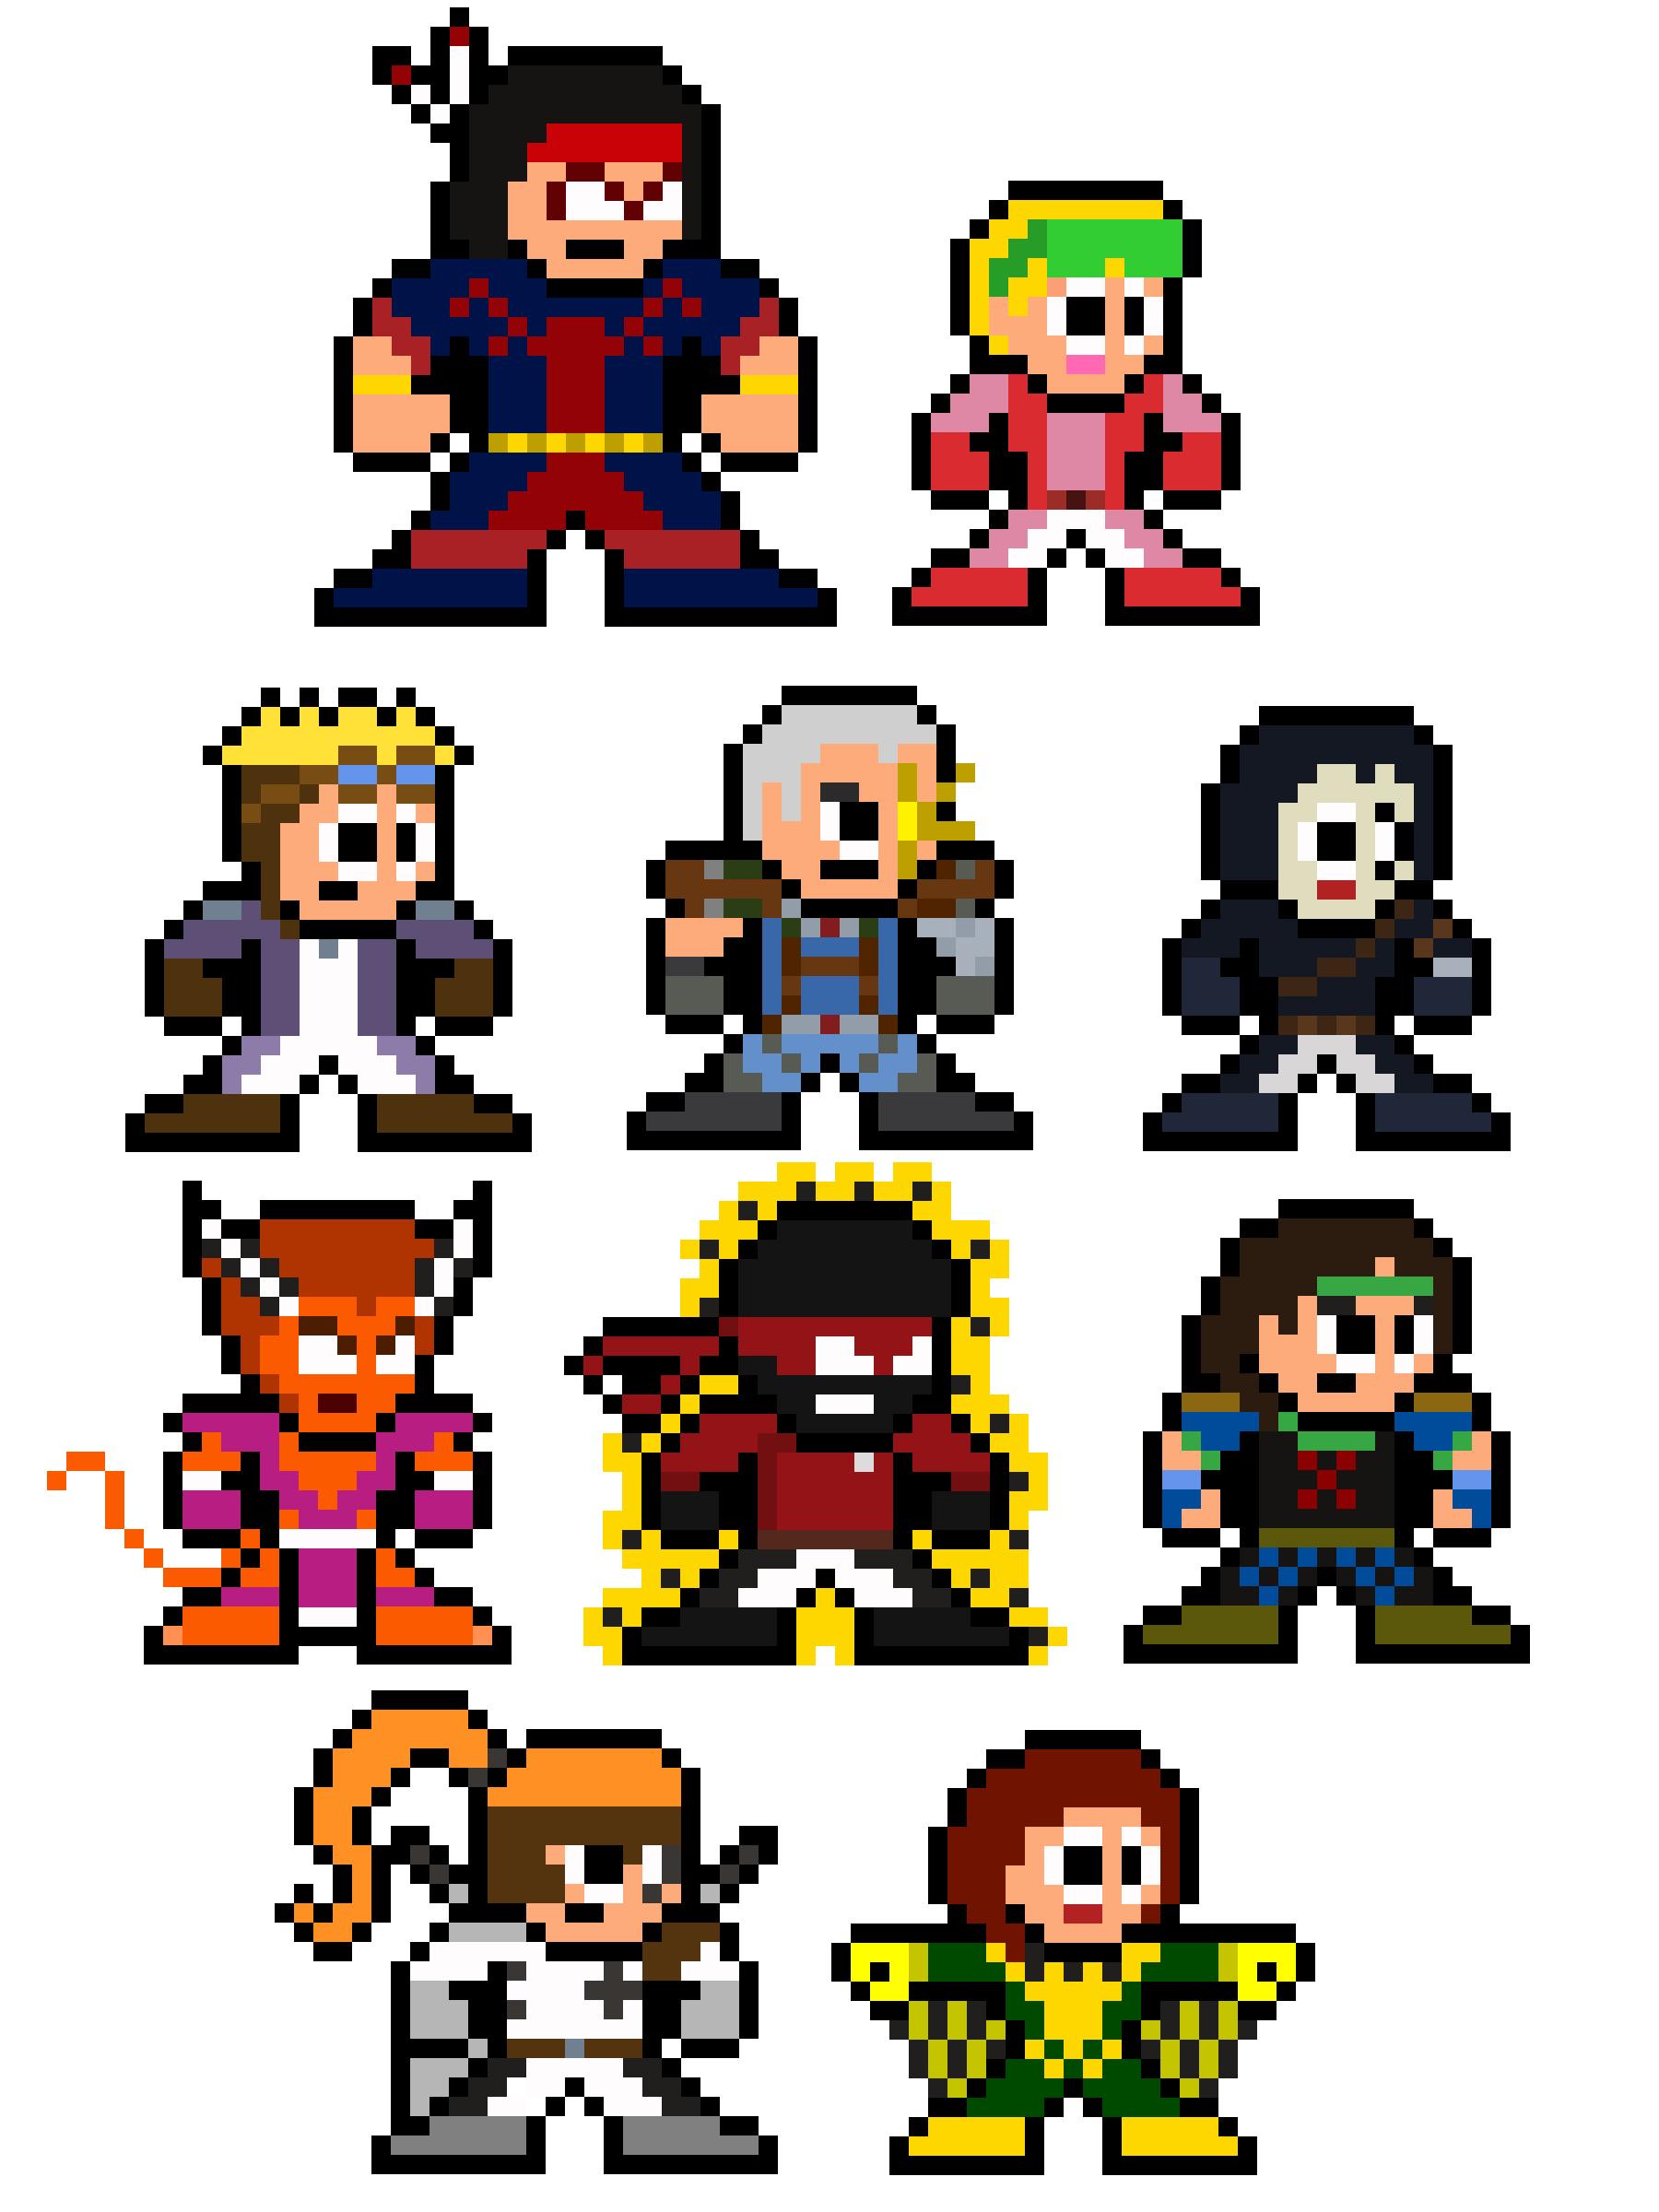 8-Bit Classic X-Force Marvel Pixel Sprites | Pixelated Pop Culture ...